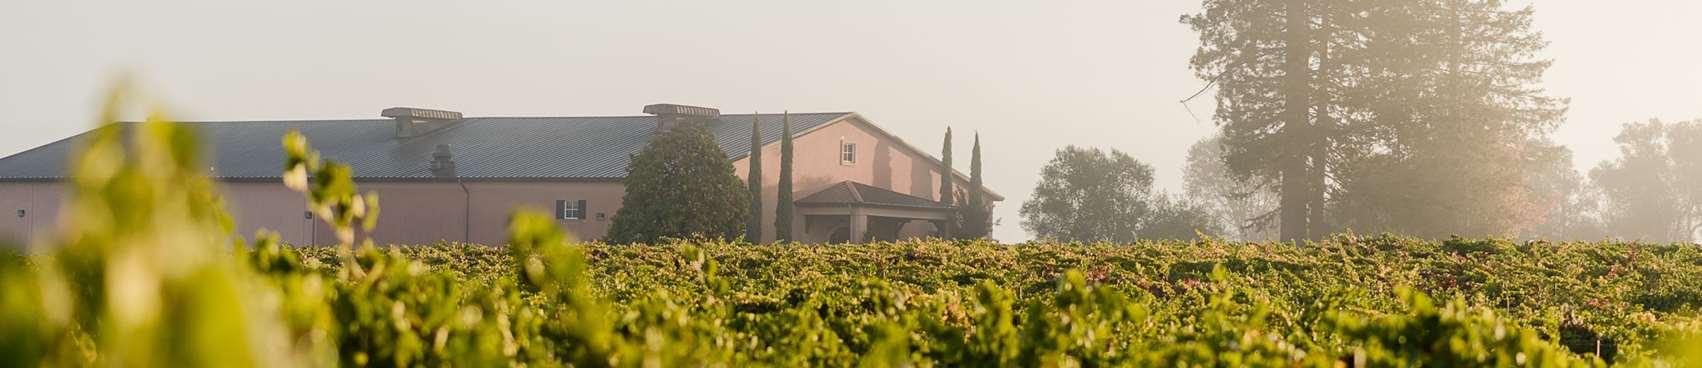 A image of Pellegrini Wine Company